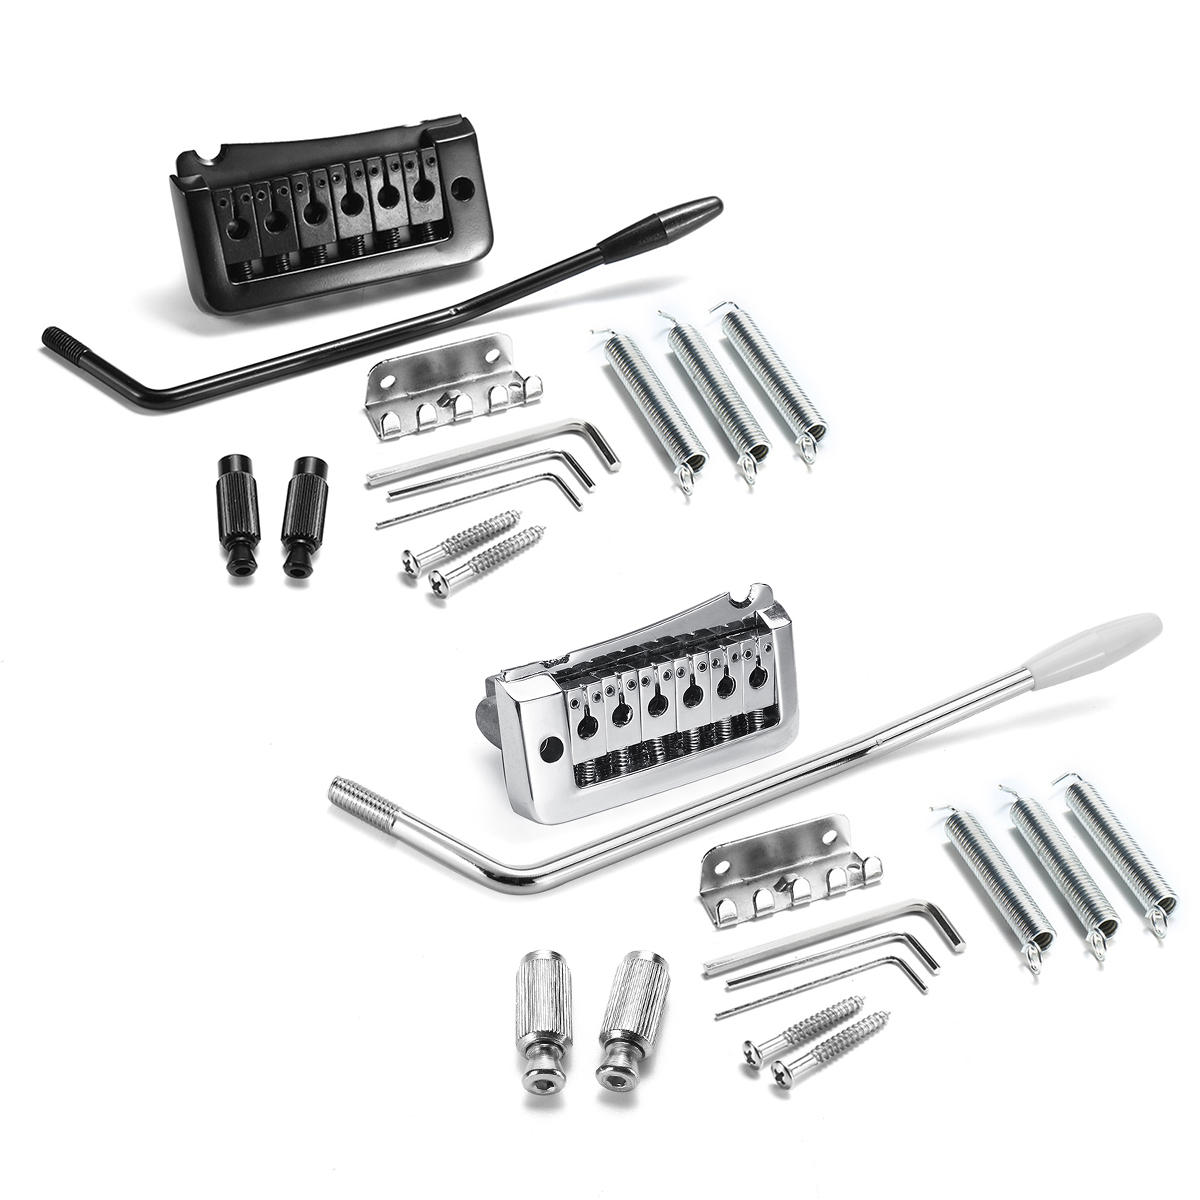 13pcs Black Silver Guitar Bridge Double Tremolo System Whammy Bar Accessory Sale